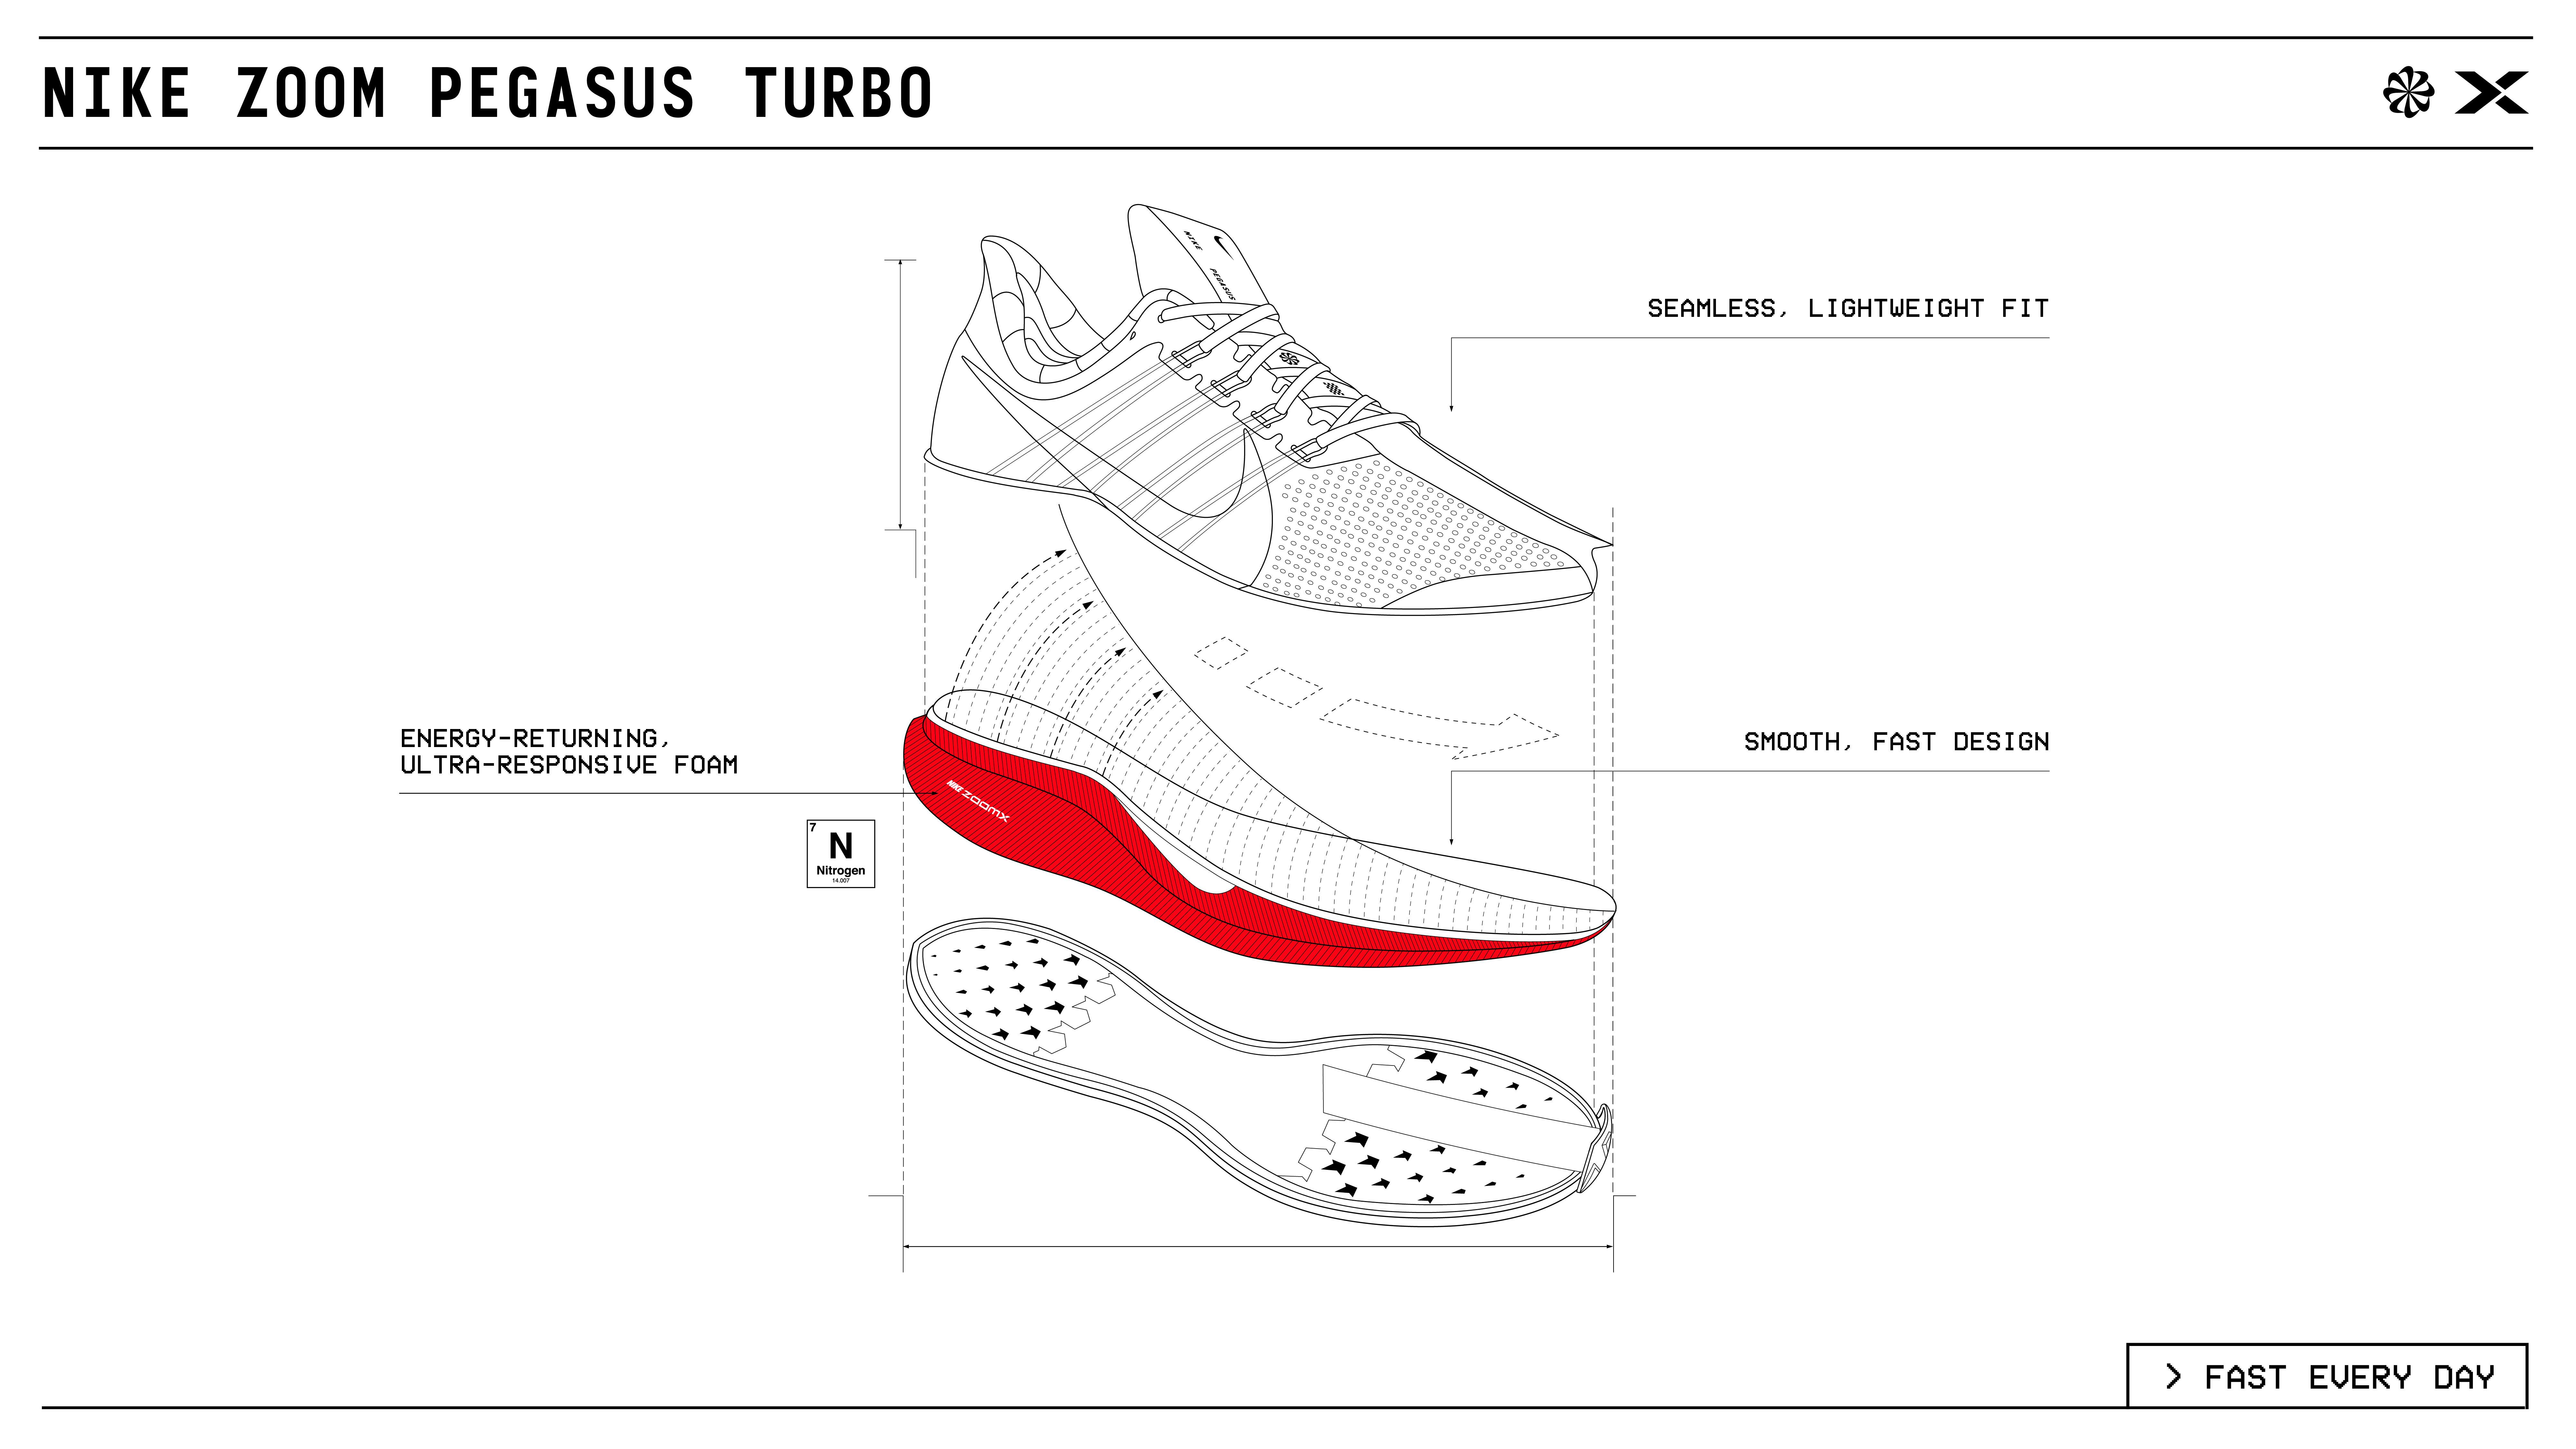 Nike Zoom Pegasus Turbo (Tech)